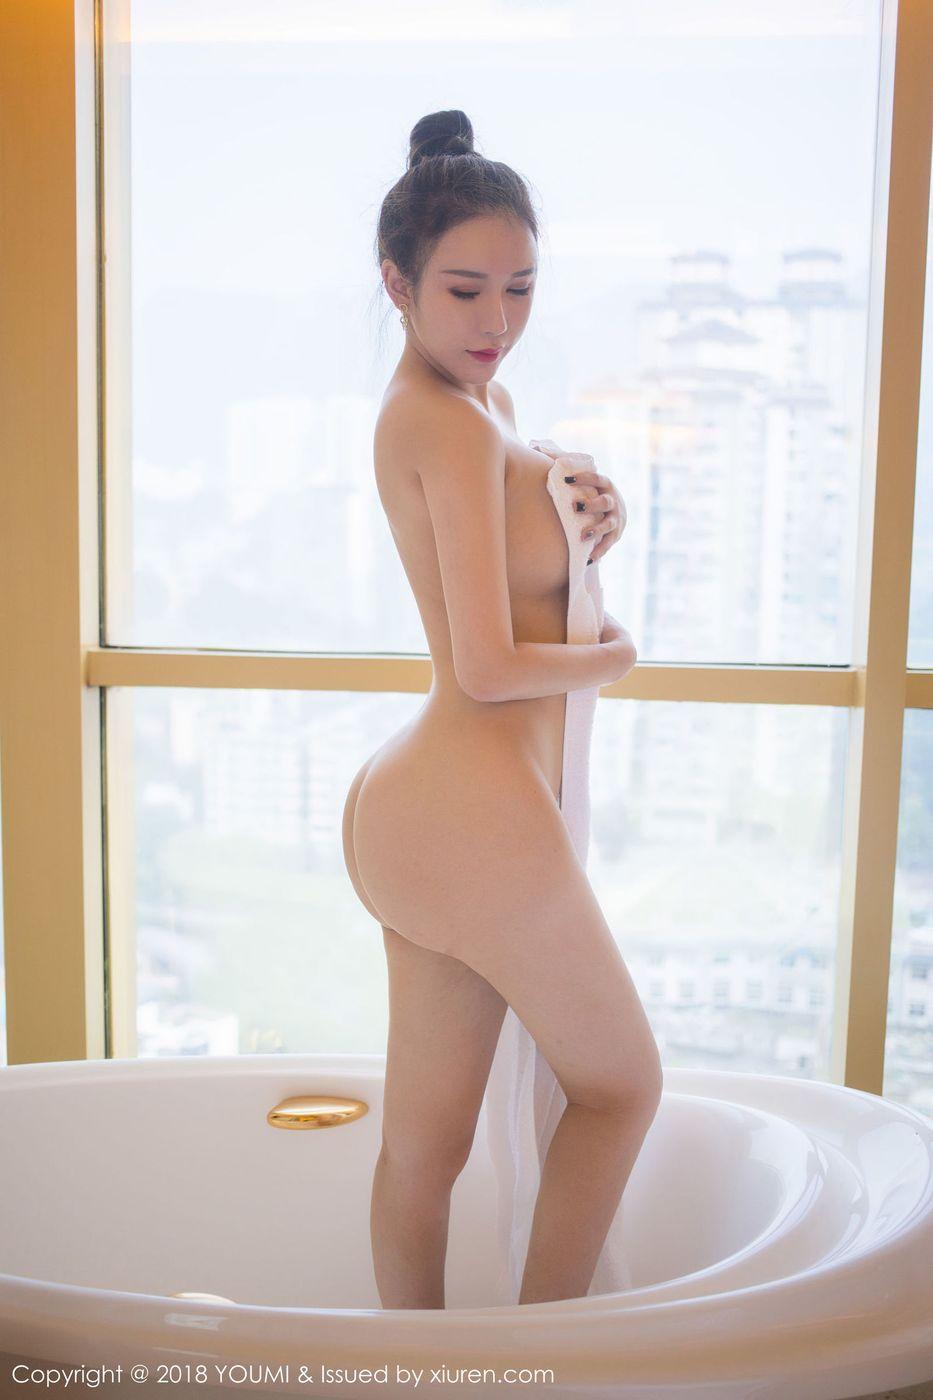 [YouMi尤蜜荟] 性感女神Egg_尤妮丝浴室丁字裤湿身诱惑写真 Vol.194